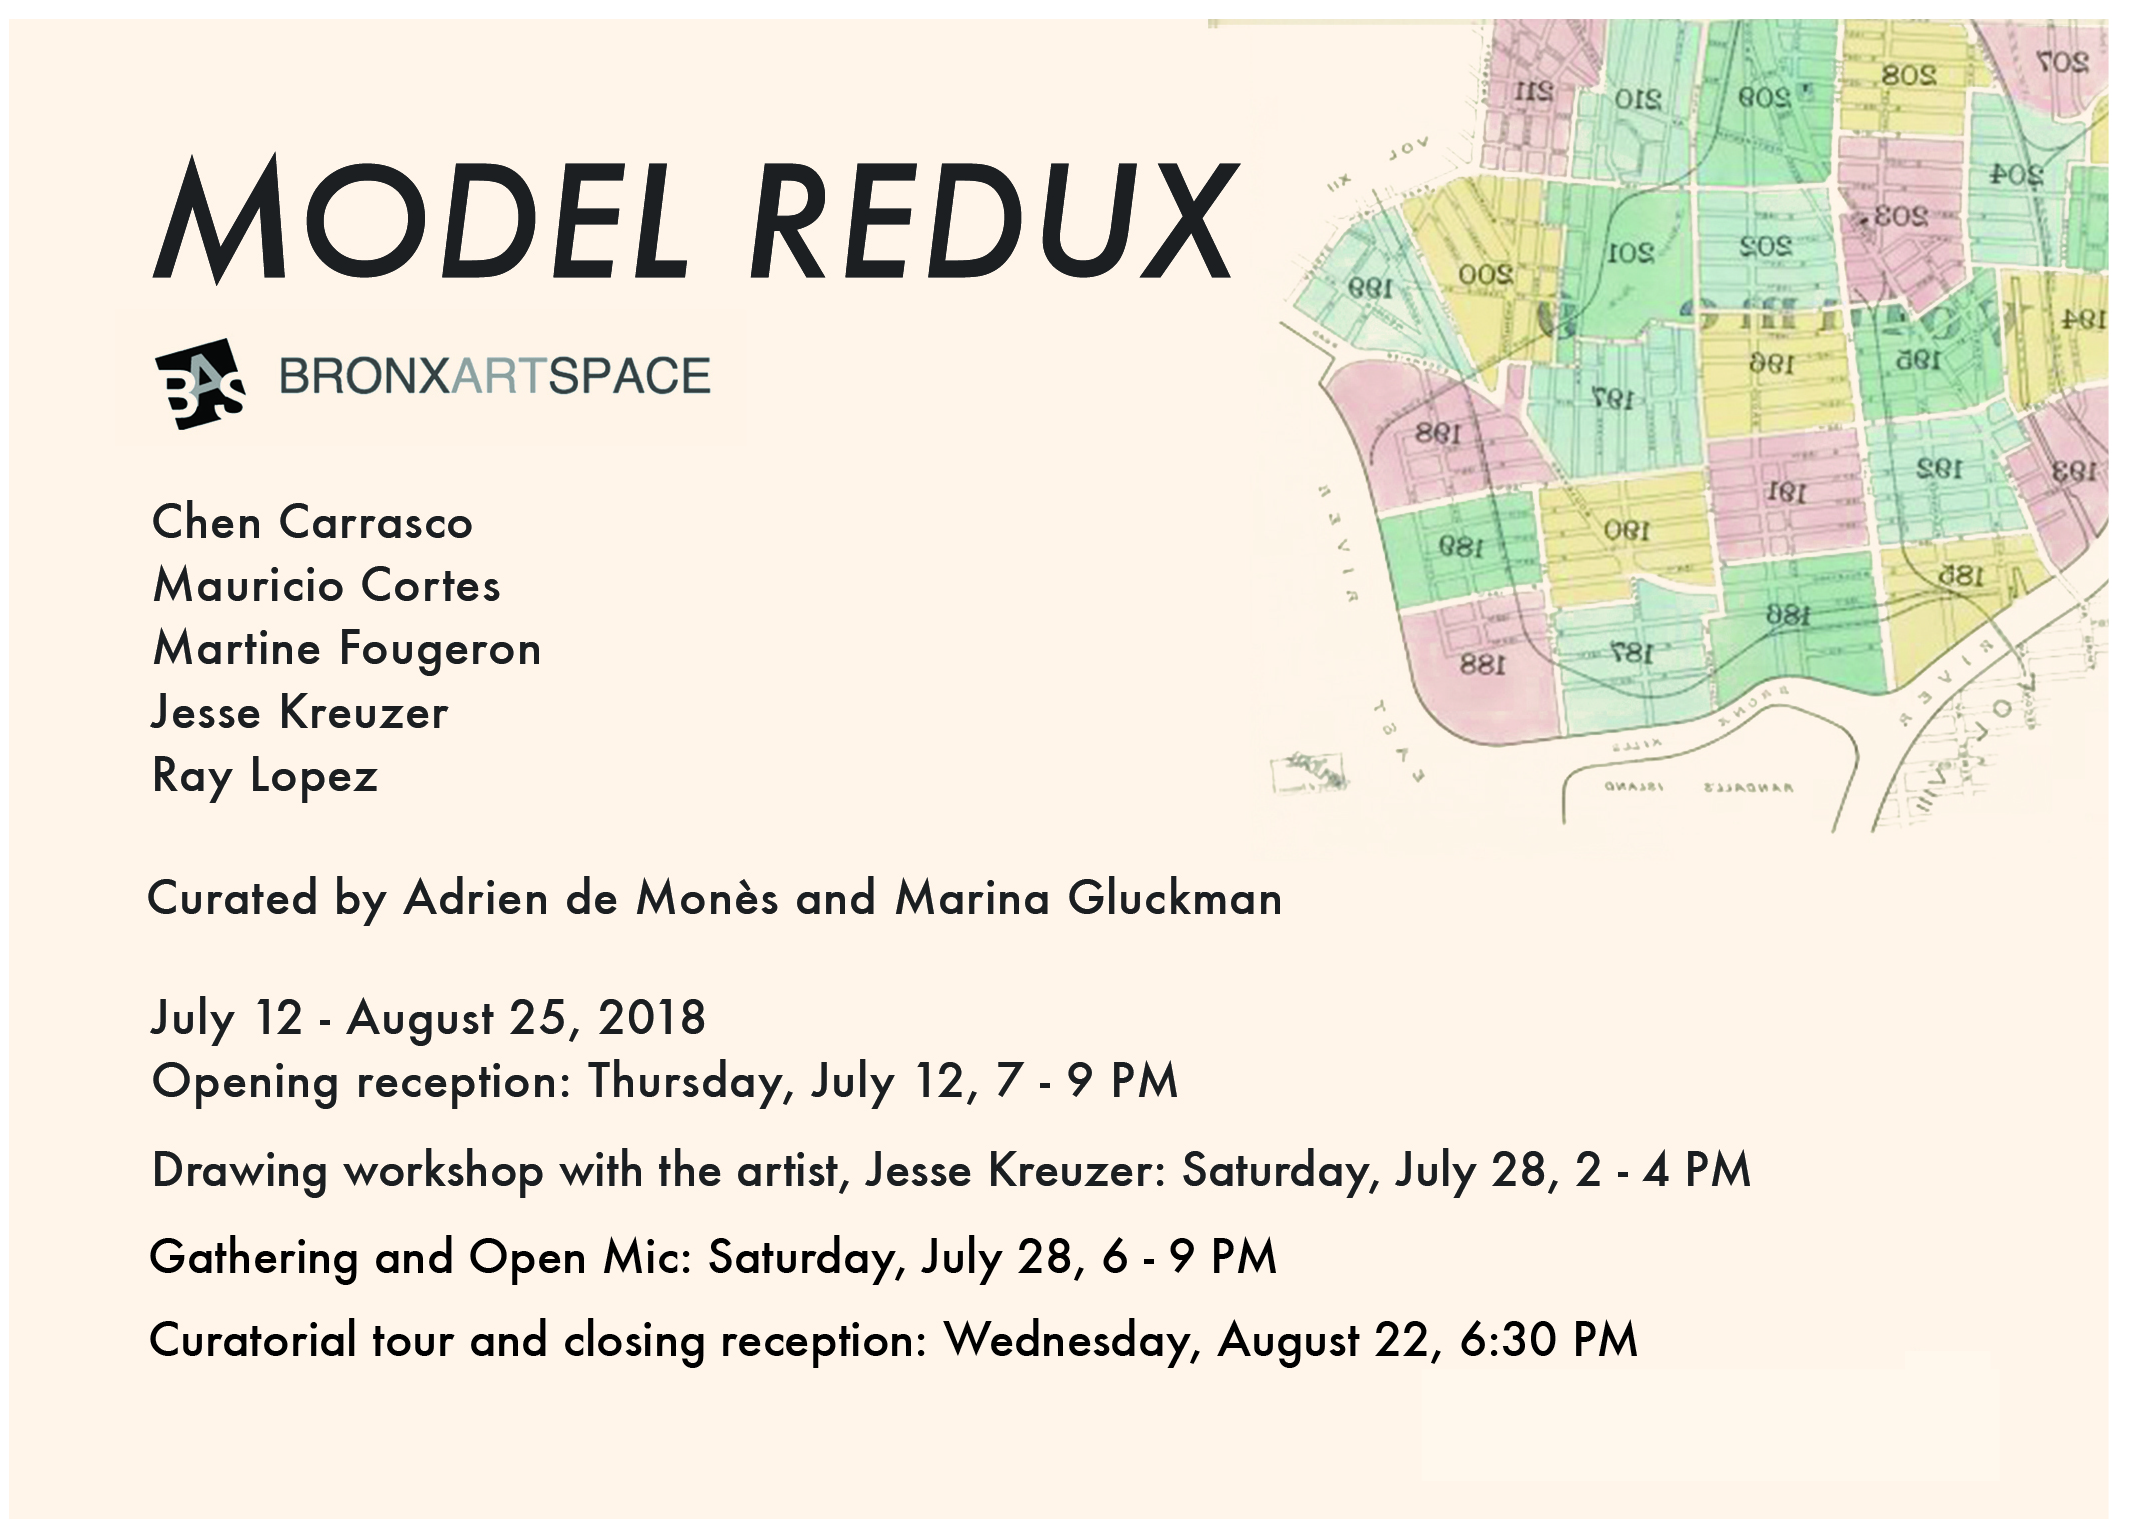 Model Redux_showcard_3.jpg